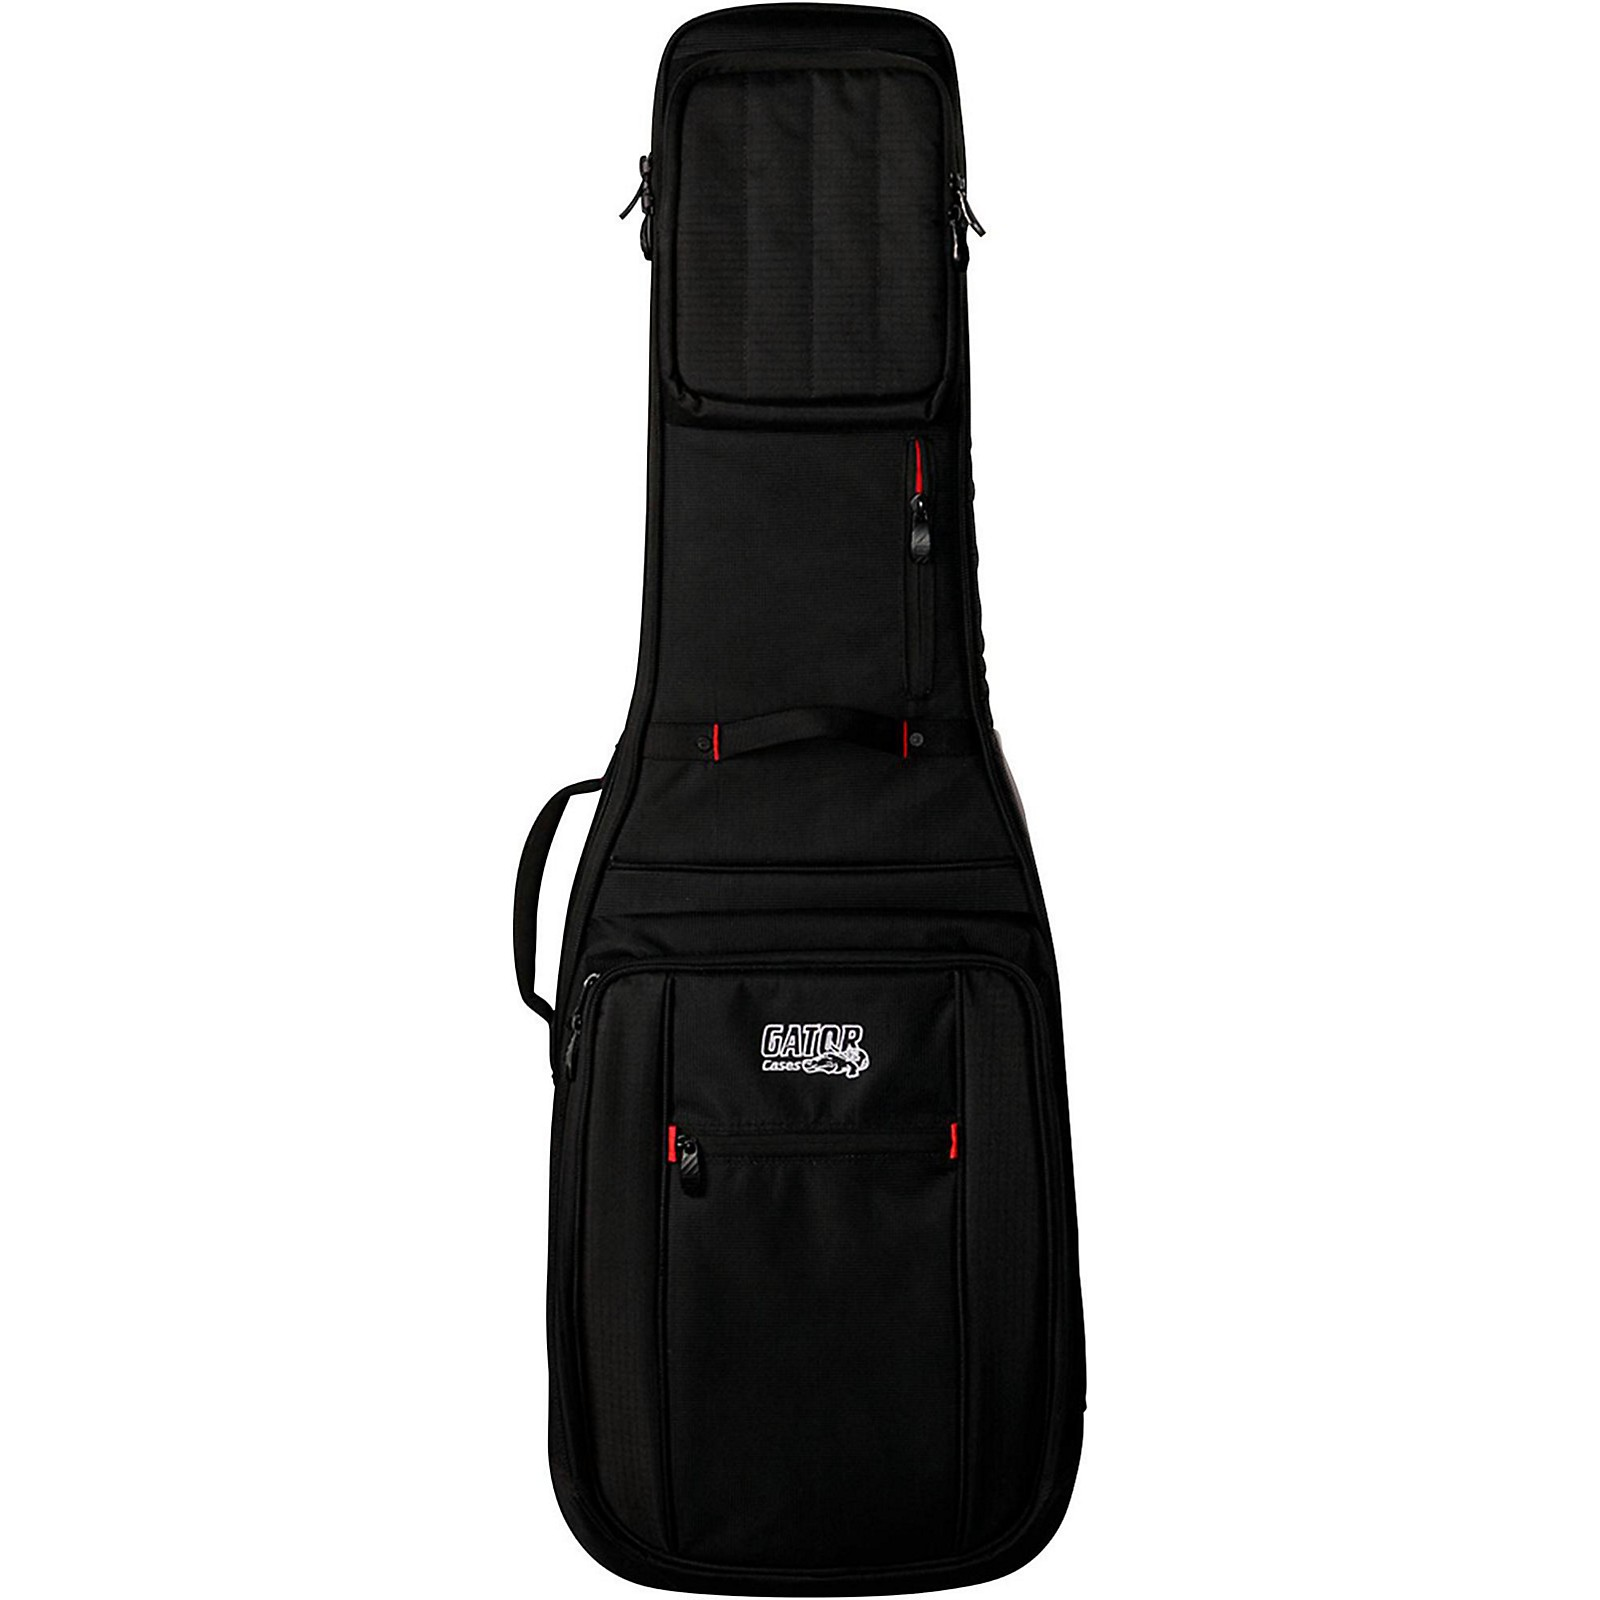 Gator G-PG ELECTRIC ProGo Series Ultimate Gig Bag for Electric Guitar